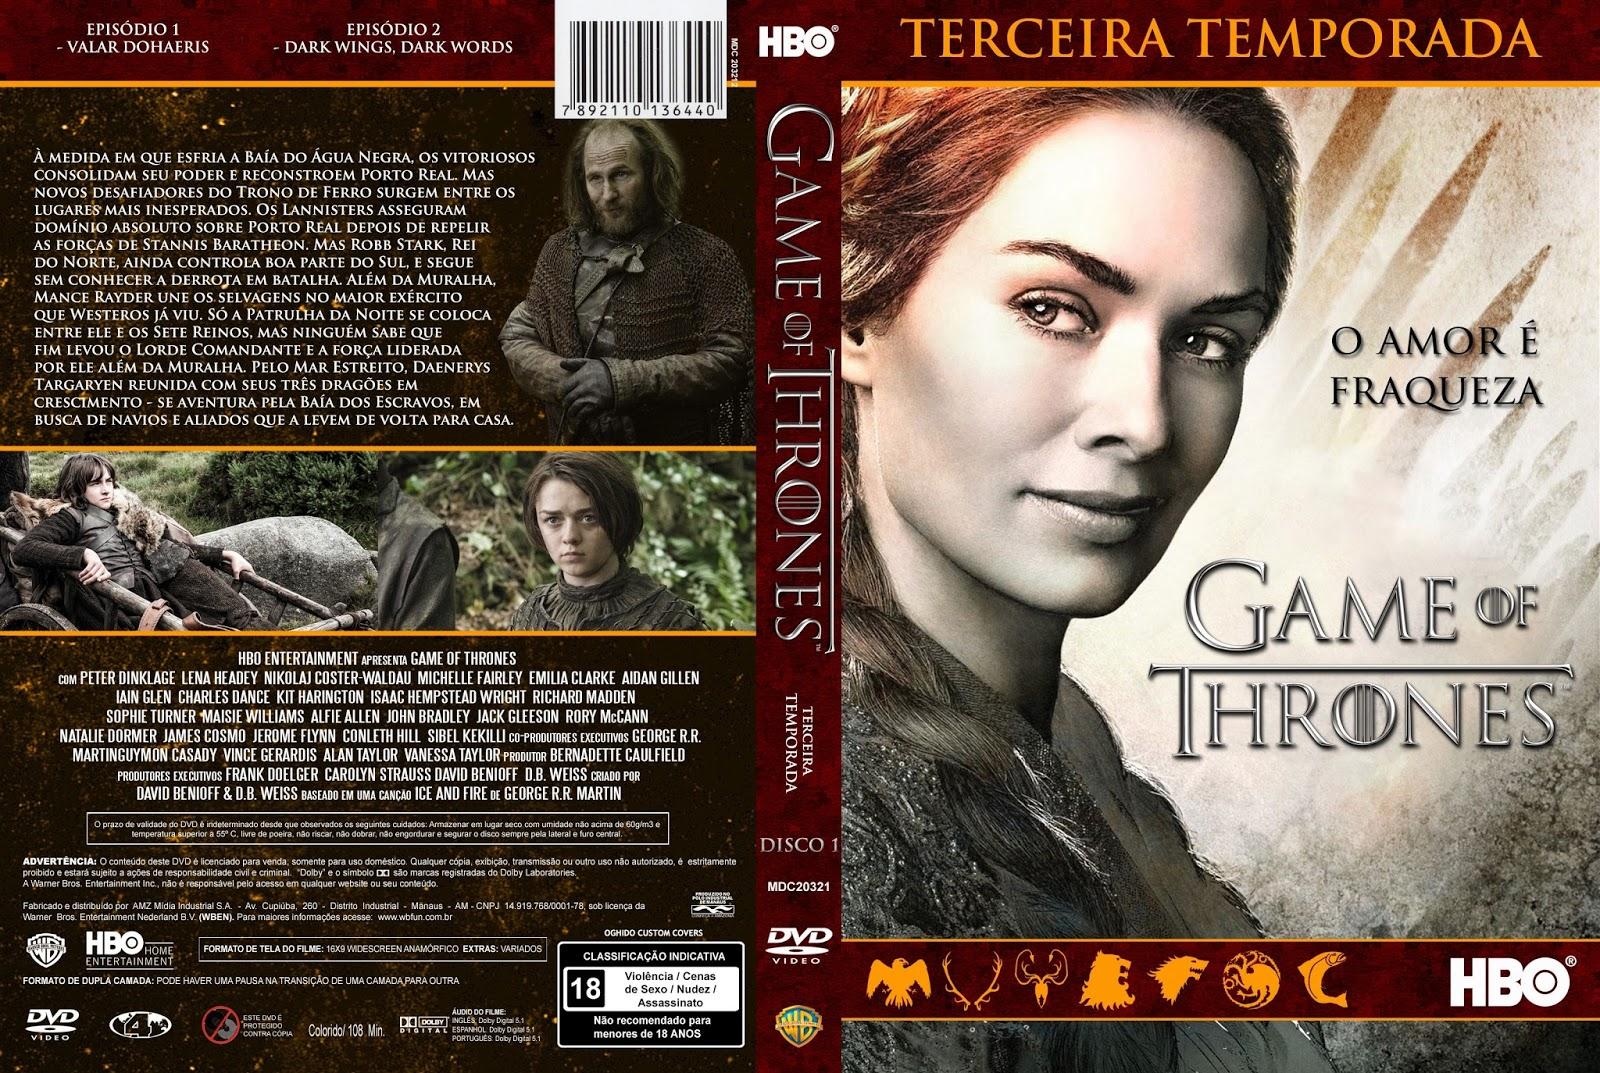 Game of Thrones Season 1 [ ] Torrent Download - MSGTorrents